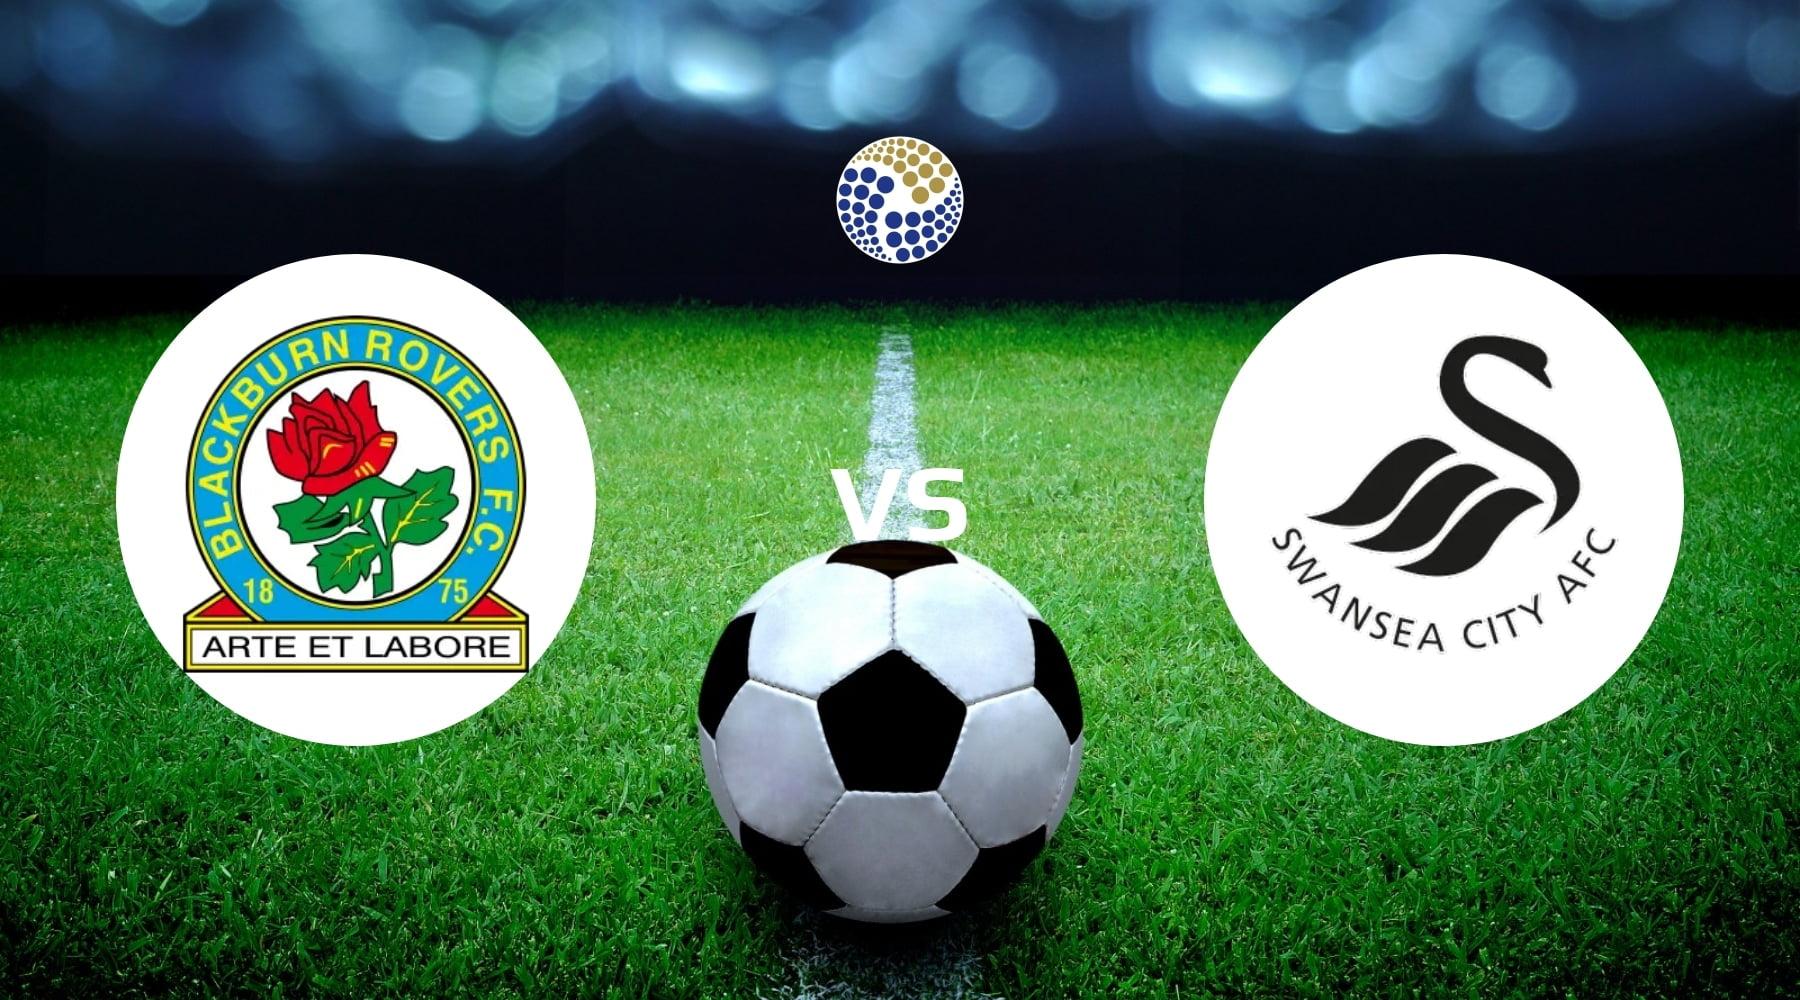 Blackburn Rovers vs Swansea City Betting